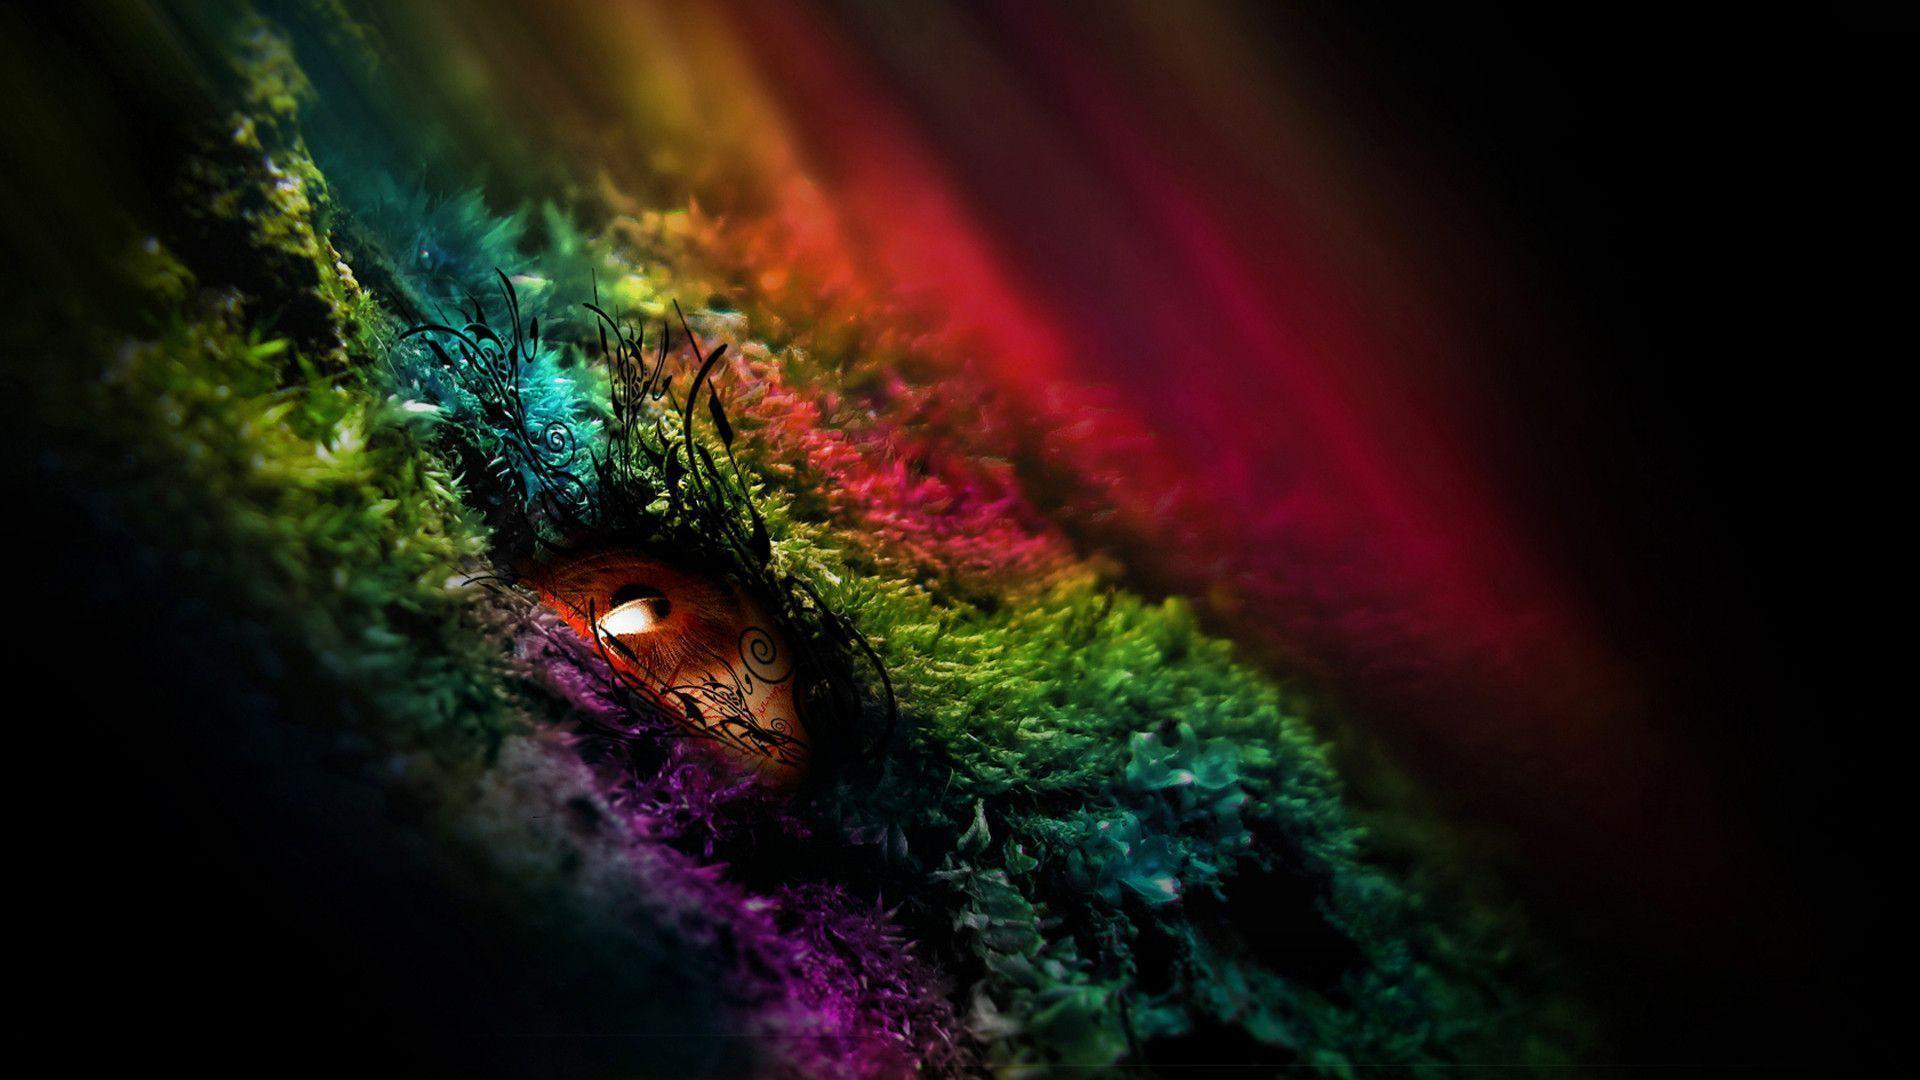 download colors hd wallpaper - photo #1